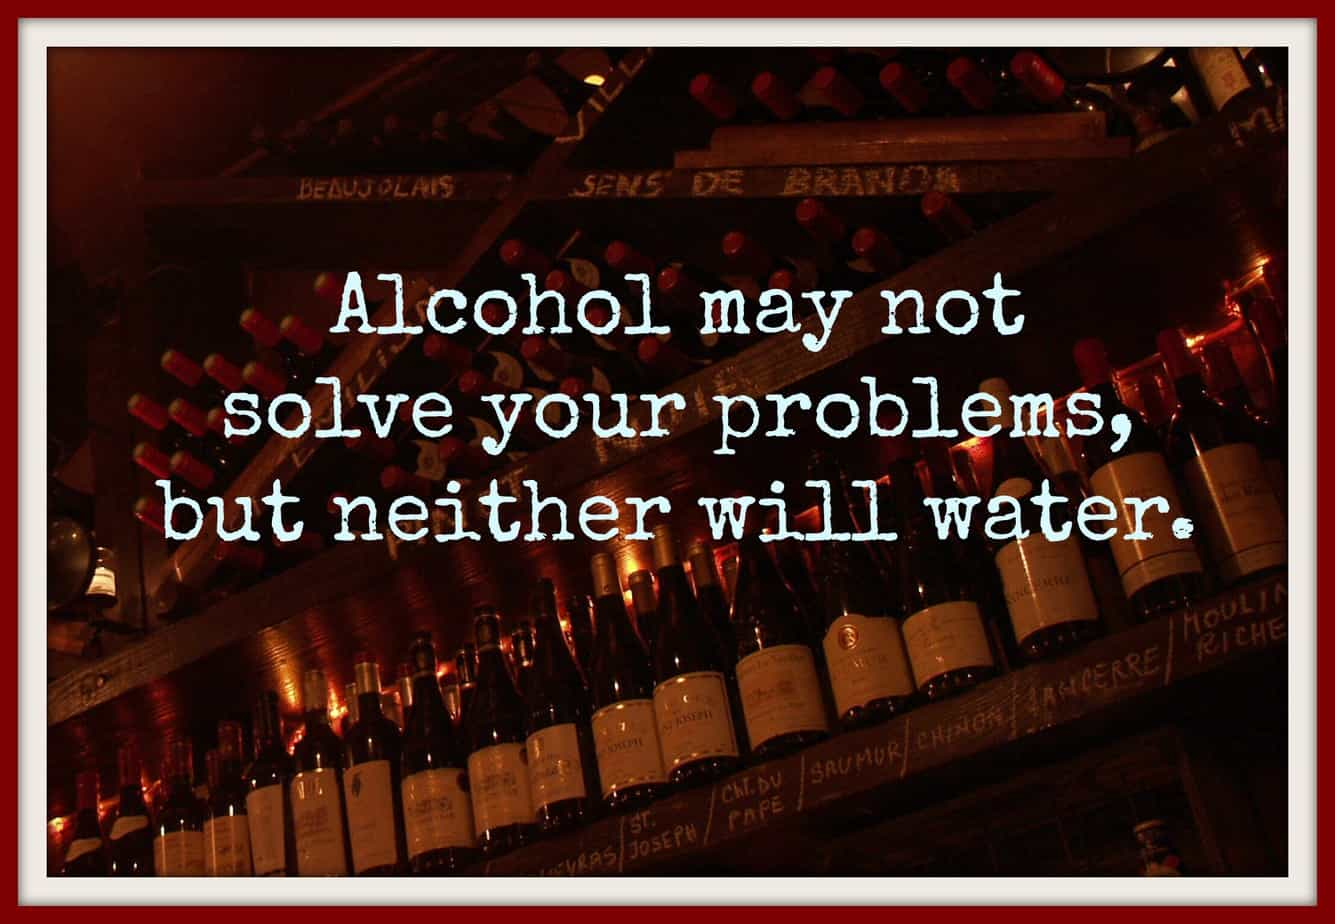 Wine Vs. Water